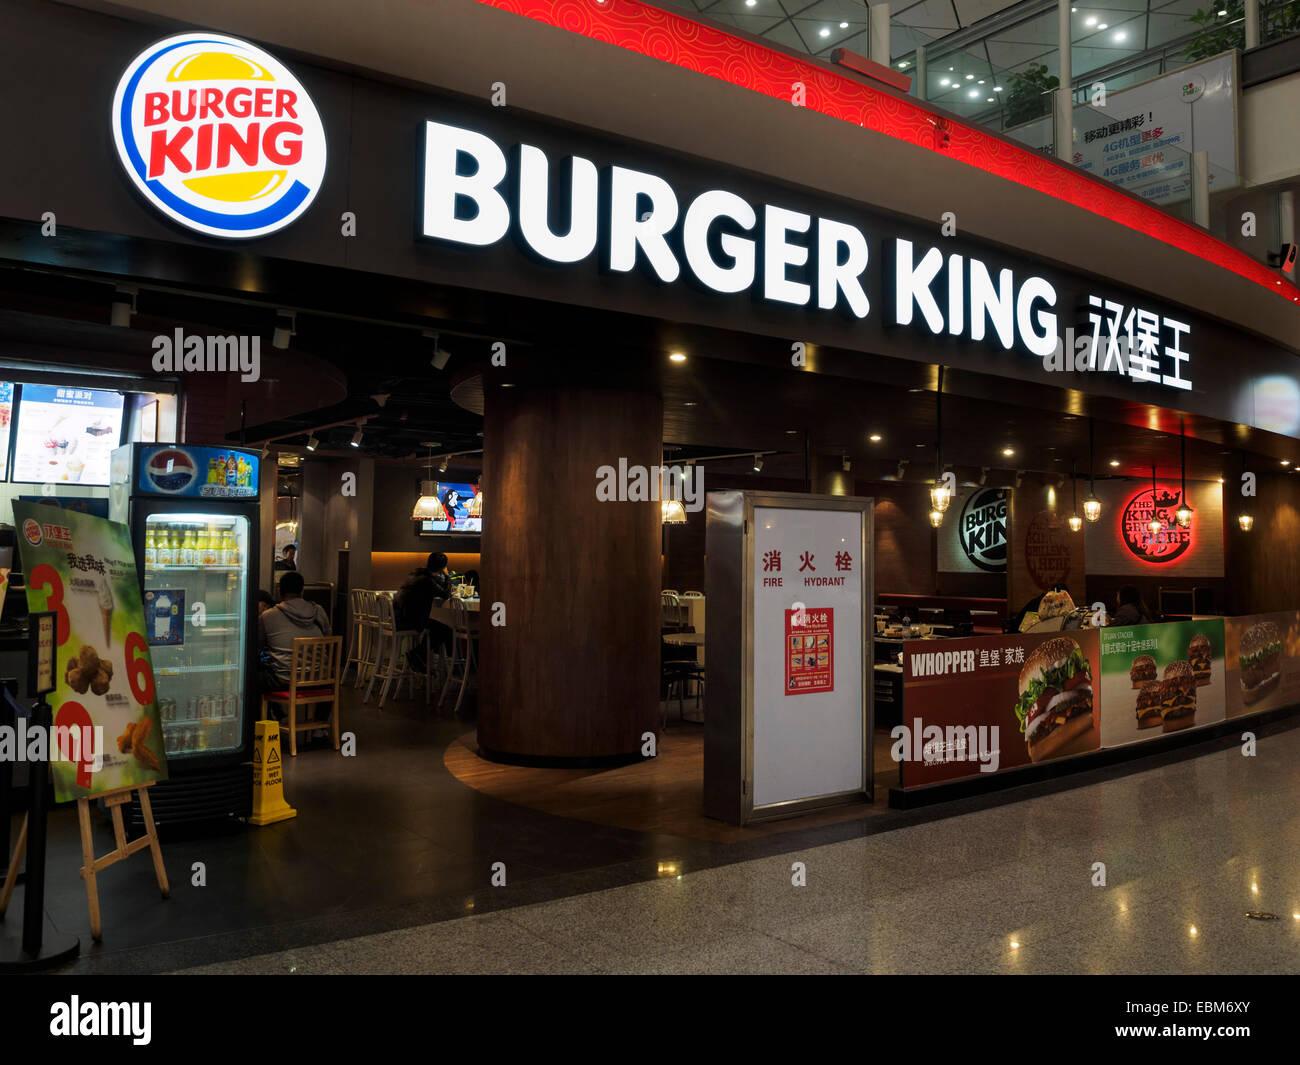 Xian Aeroporto : Burger king restaurante no aeroporto de xian na china foto imagem